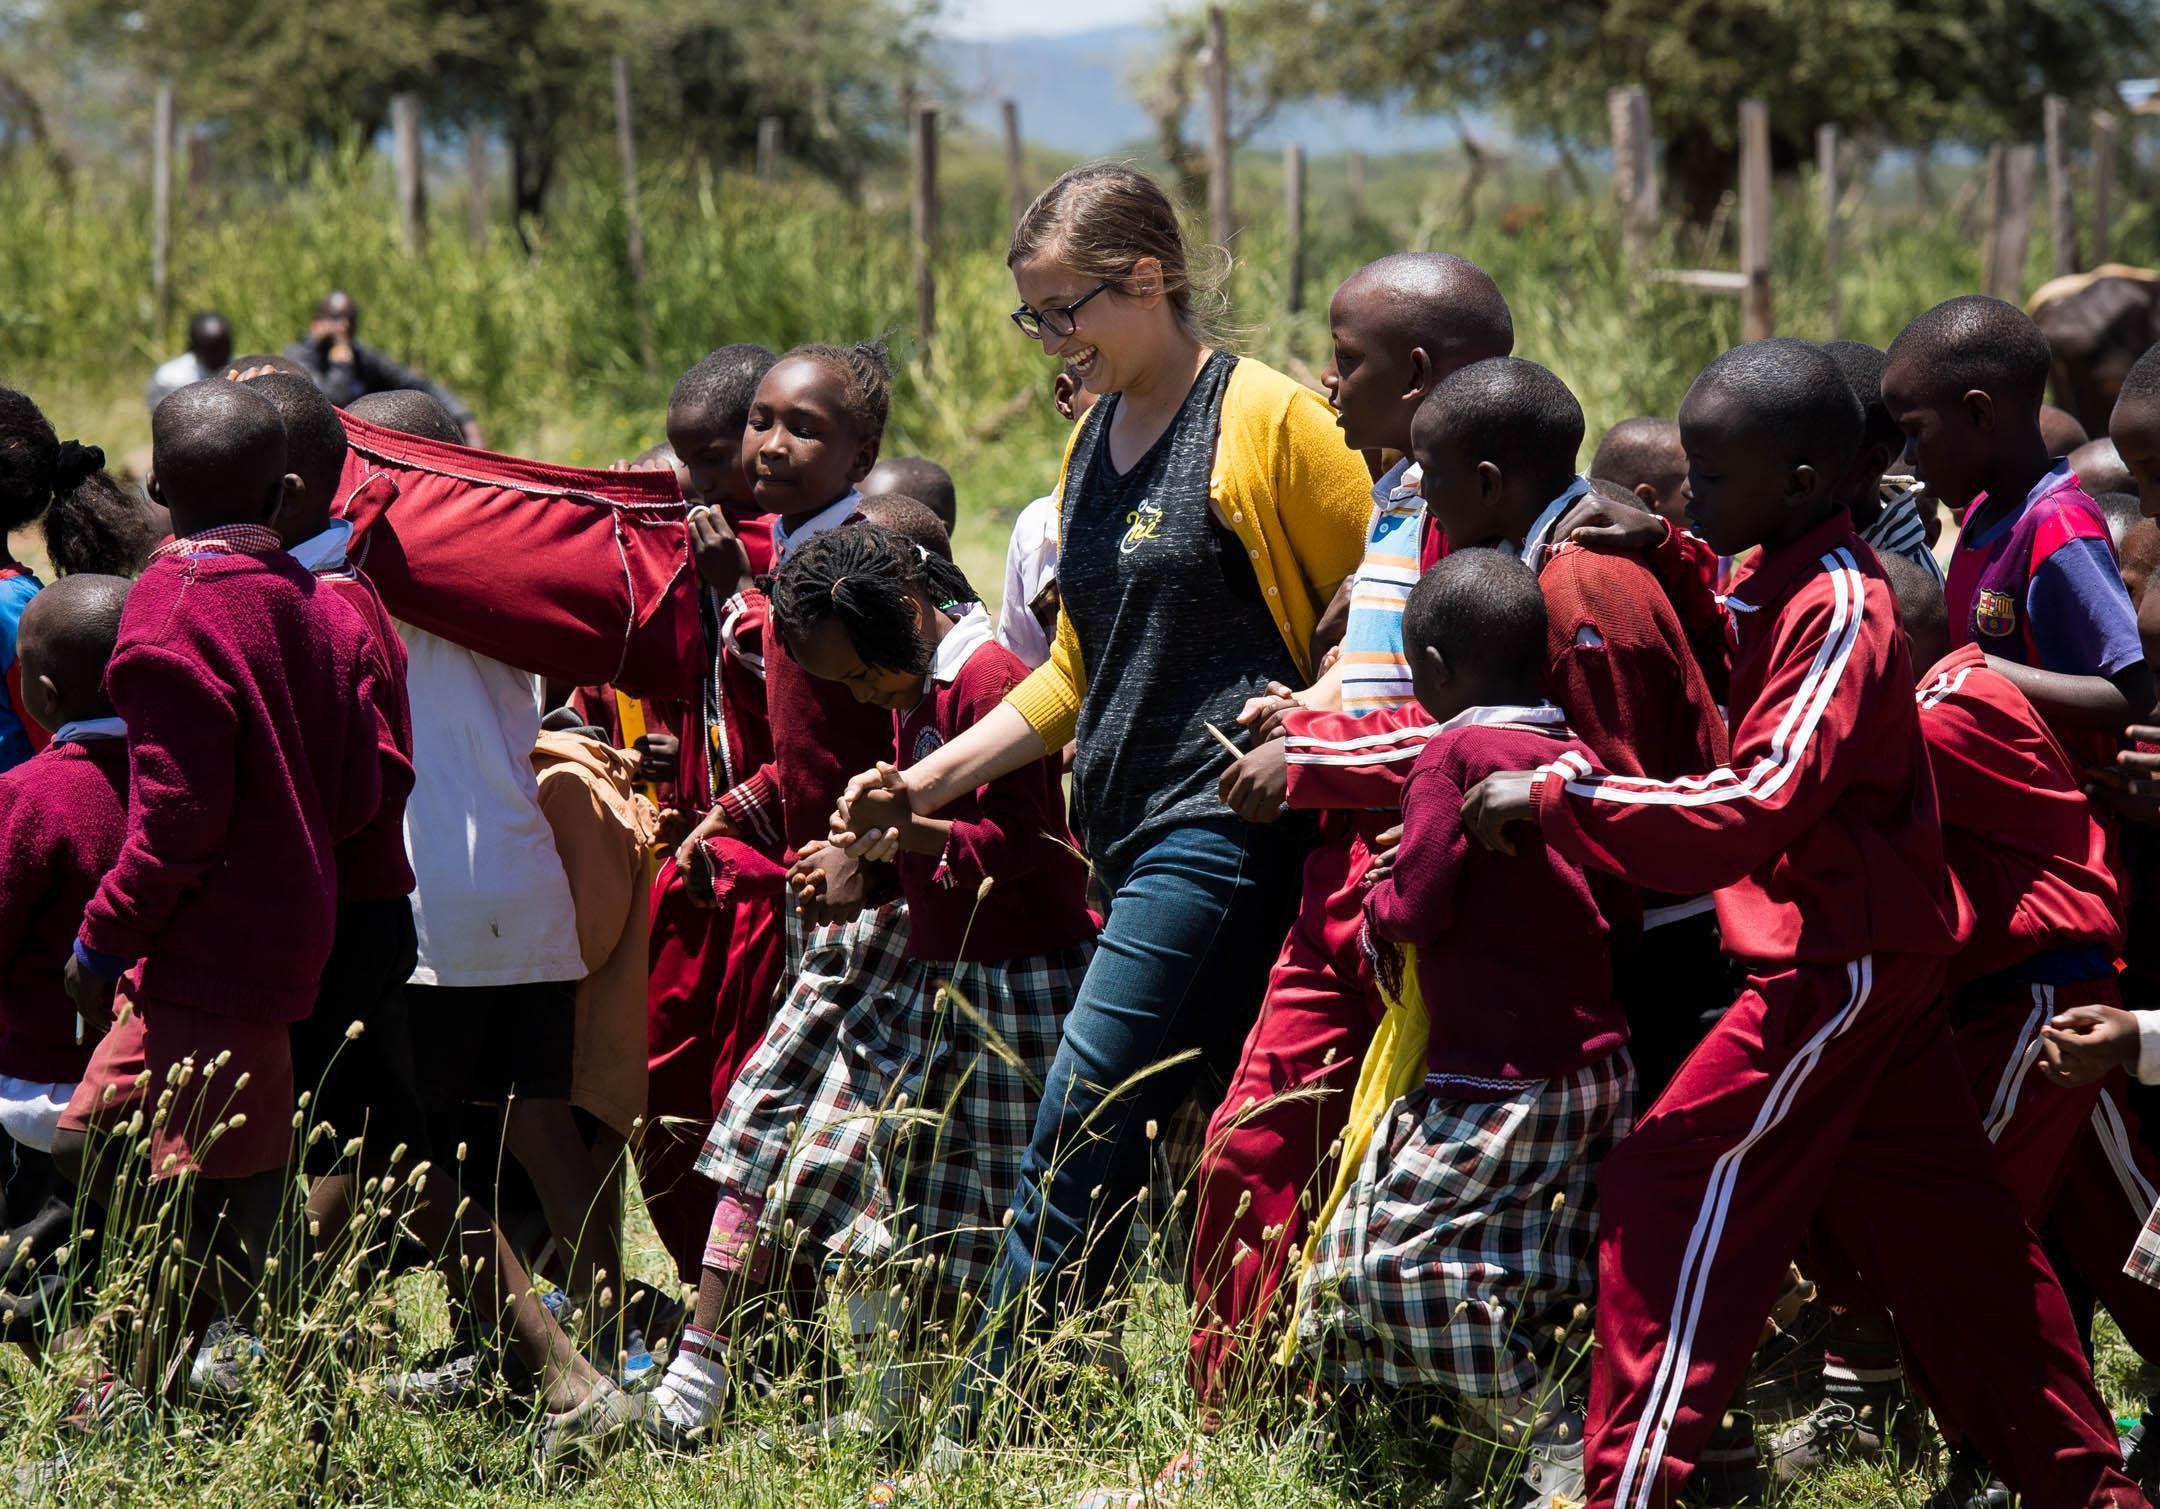 africa children humanitarian aid education culture.jpg